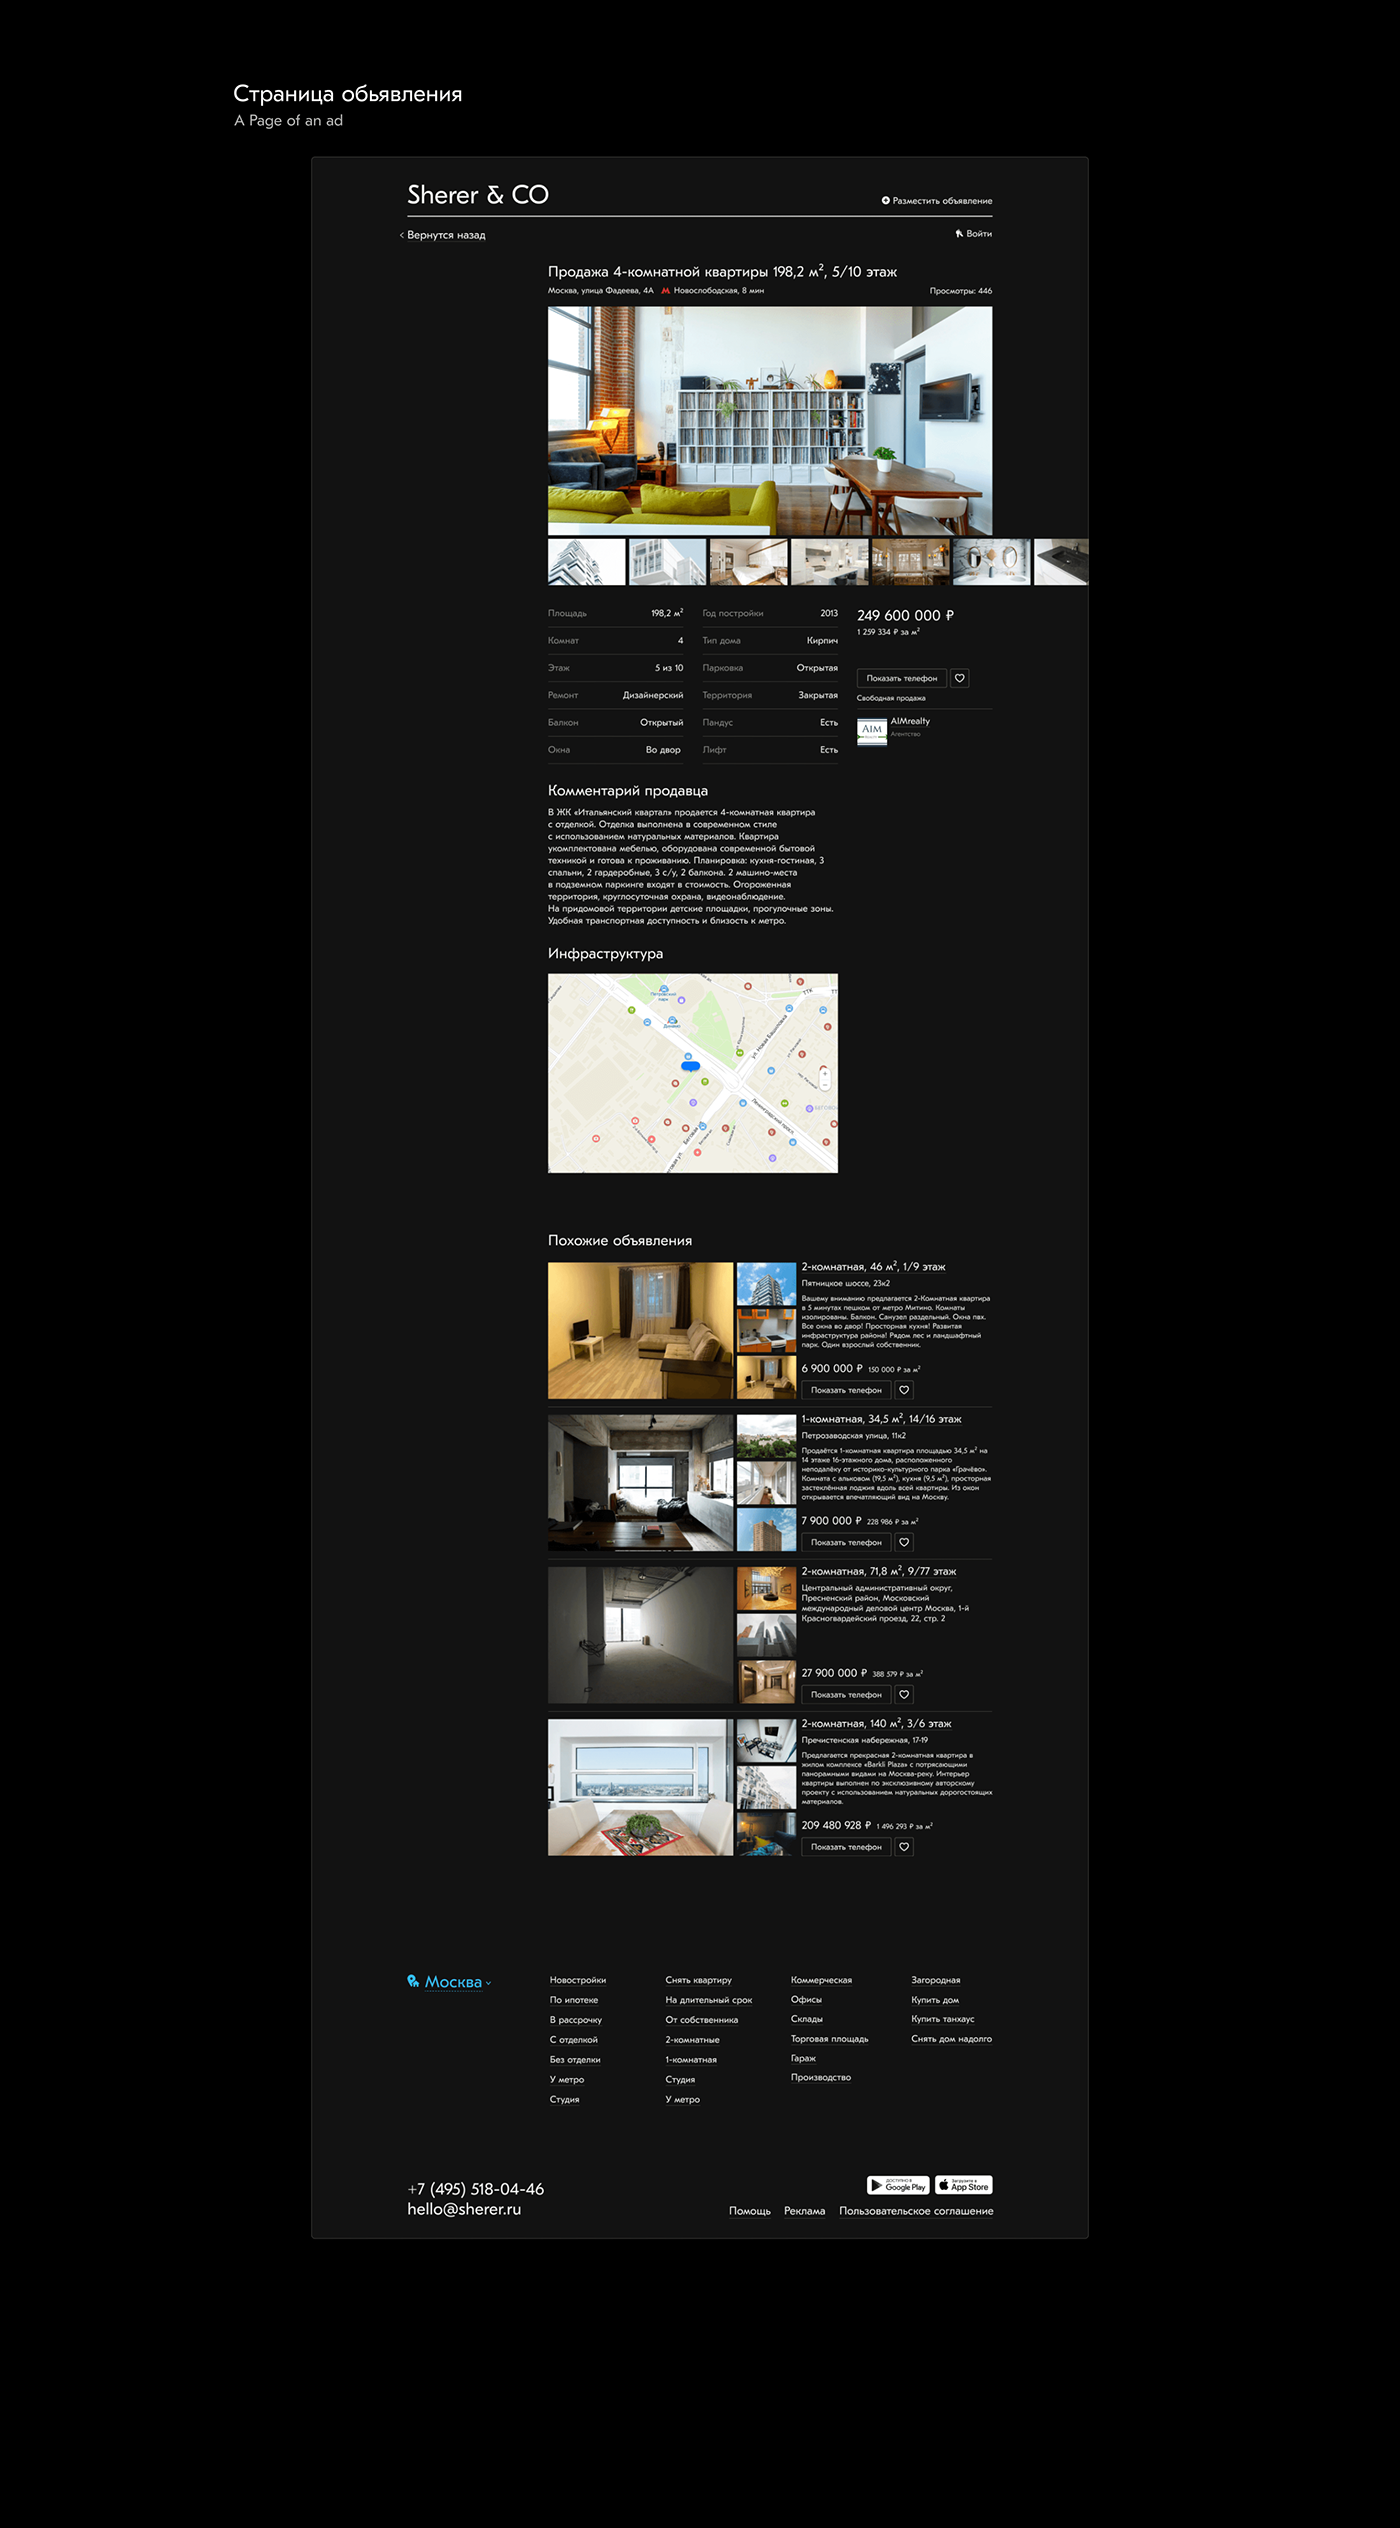 real estate realestate UI ui design UI/UX ux Web Design  Website недвижимость